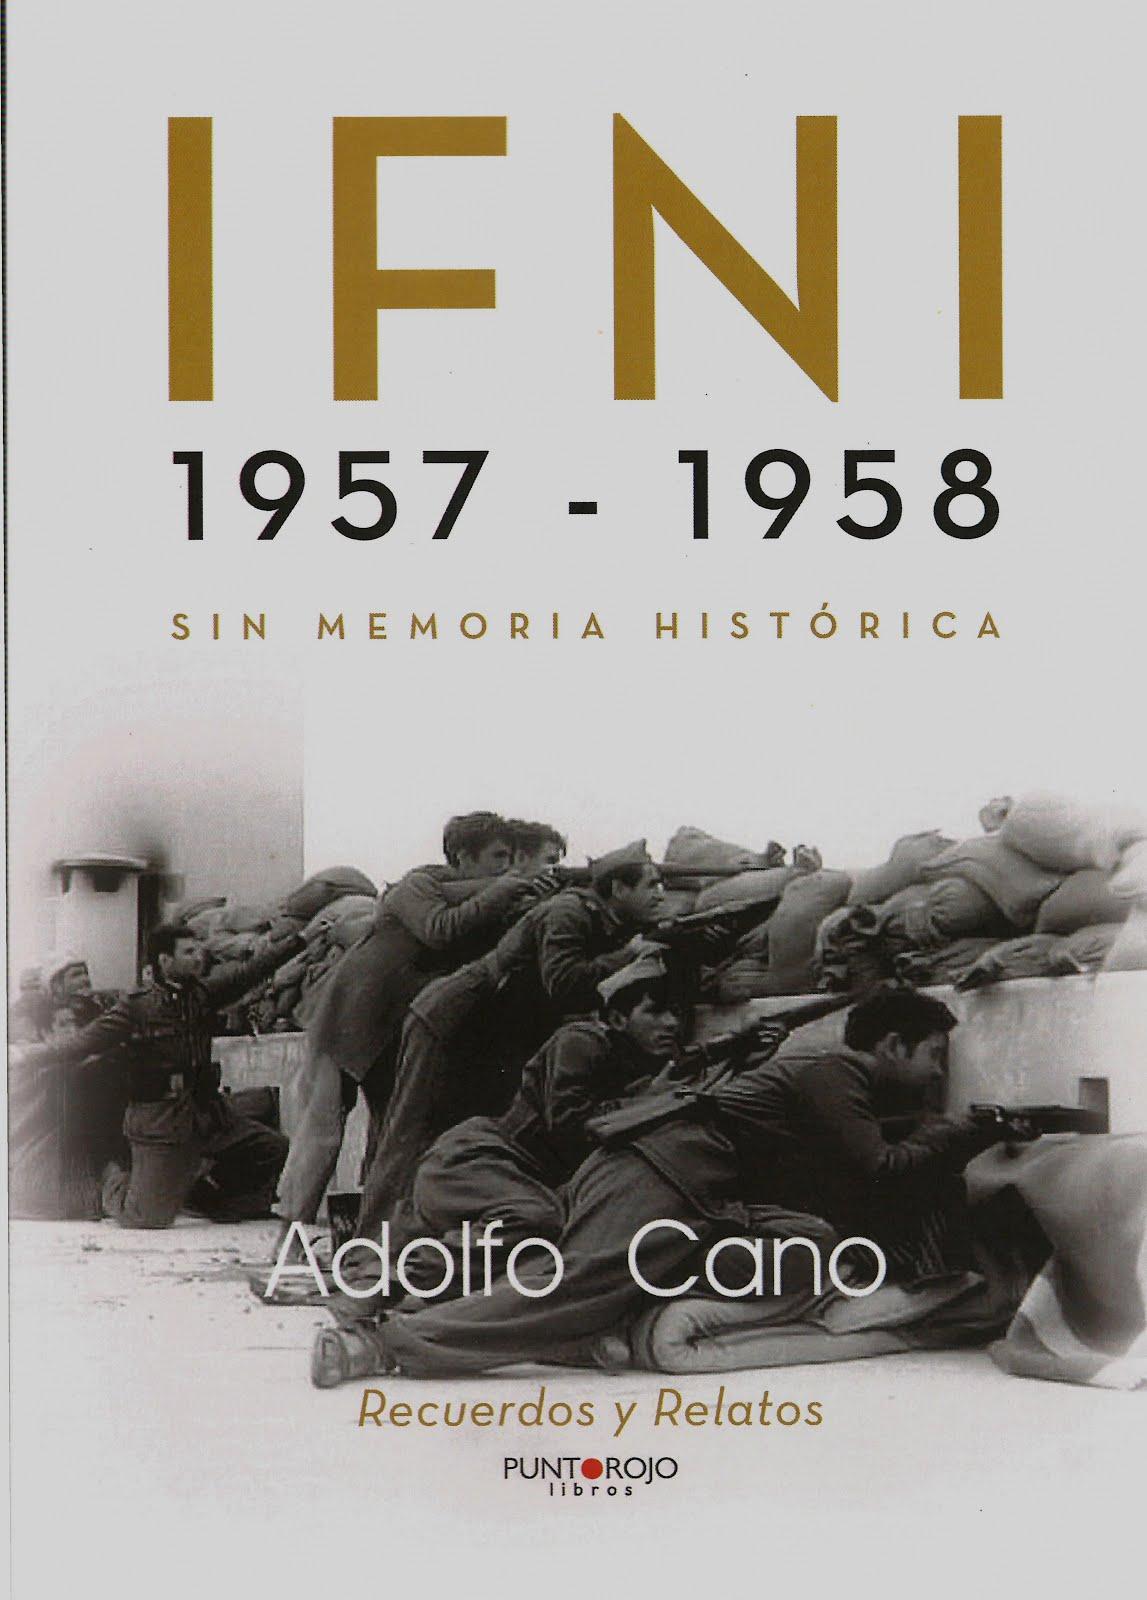 IFNI1957-1958 SIN MEMORIA HISTÓRICA